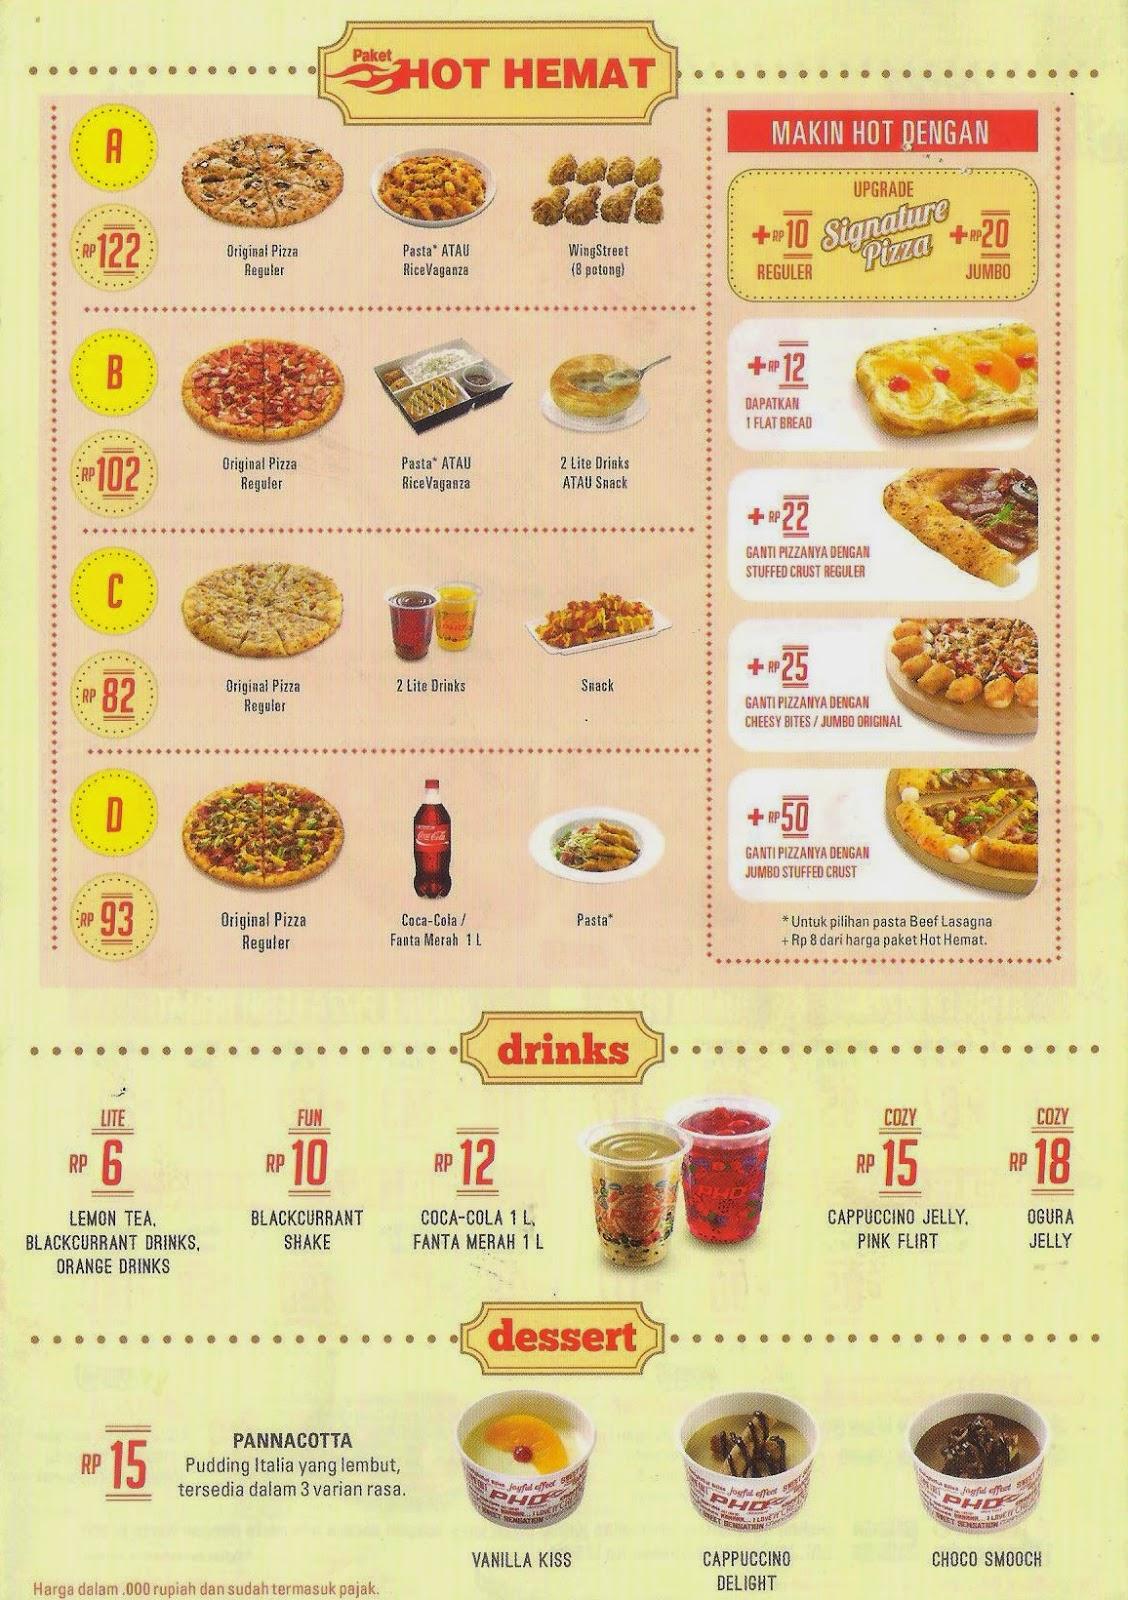 Daftar Menu Pizza Hut | newhairstylesformen2014.com